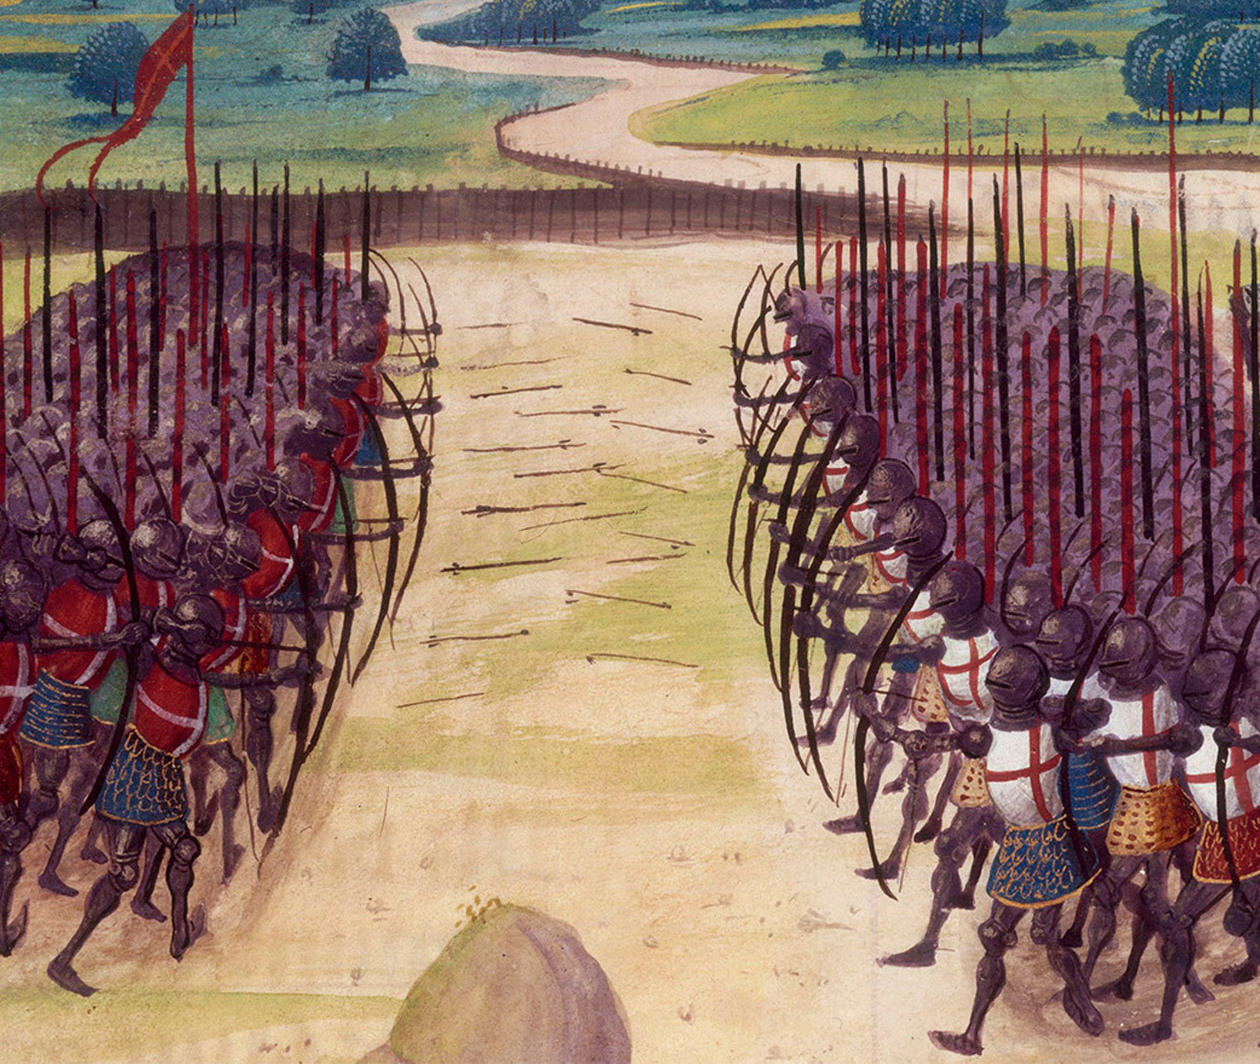 Agincourt 1415: Myth and Reality